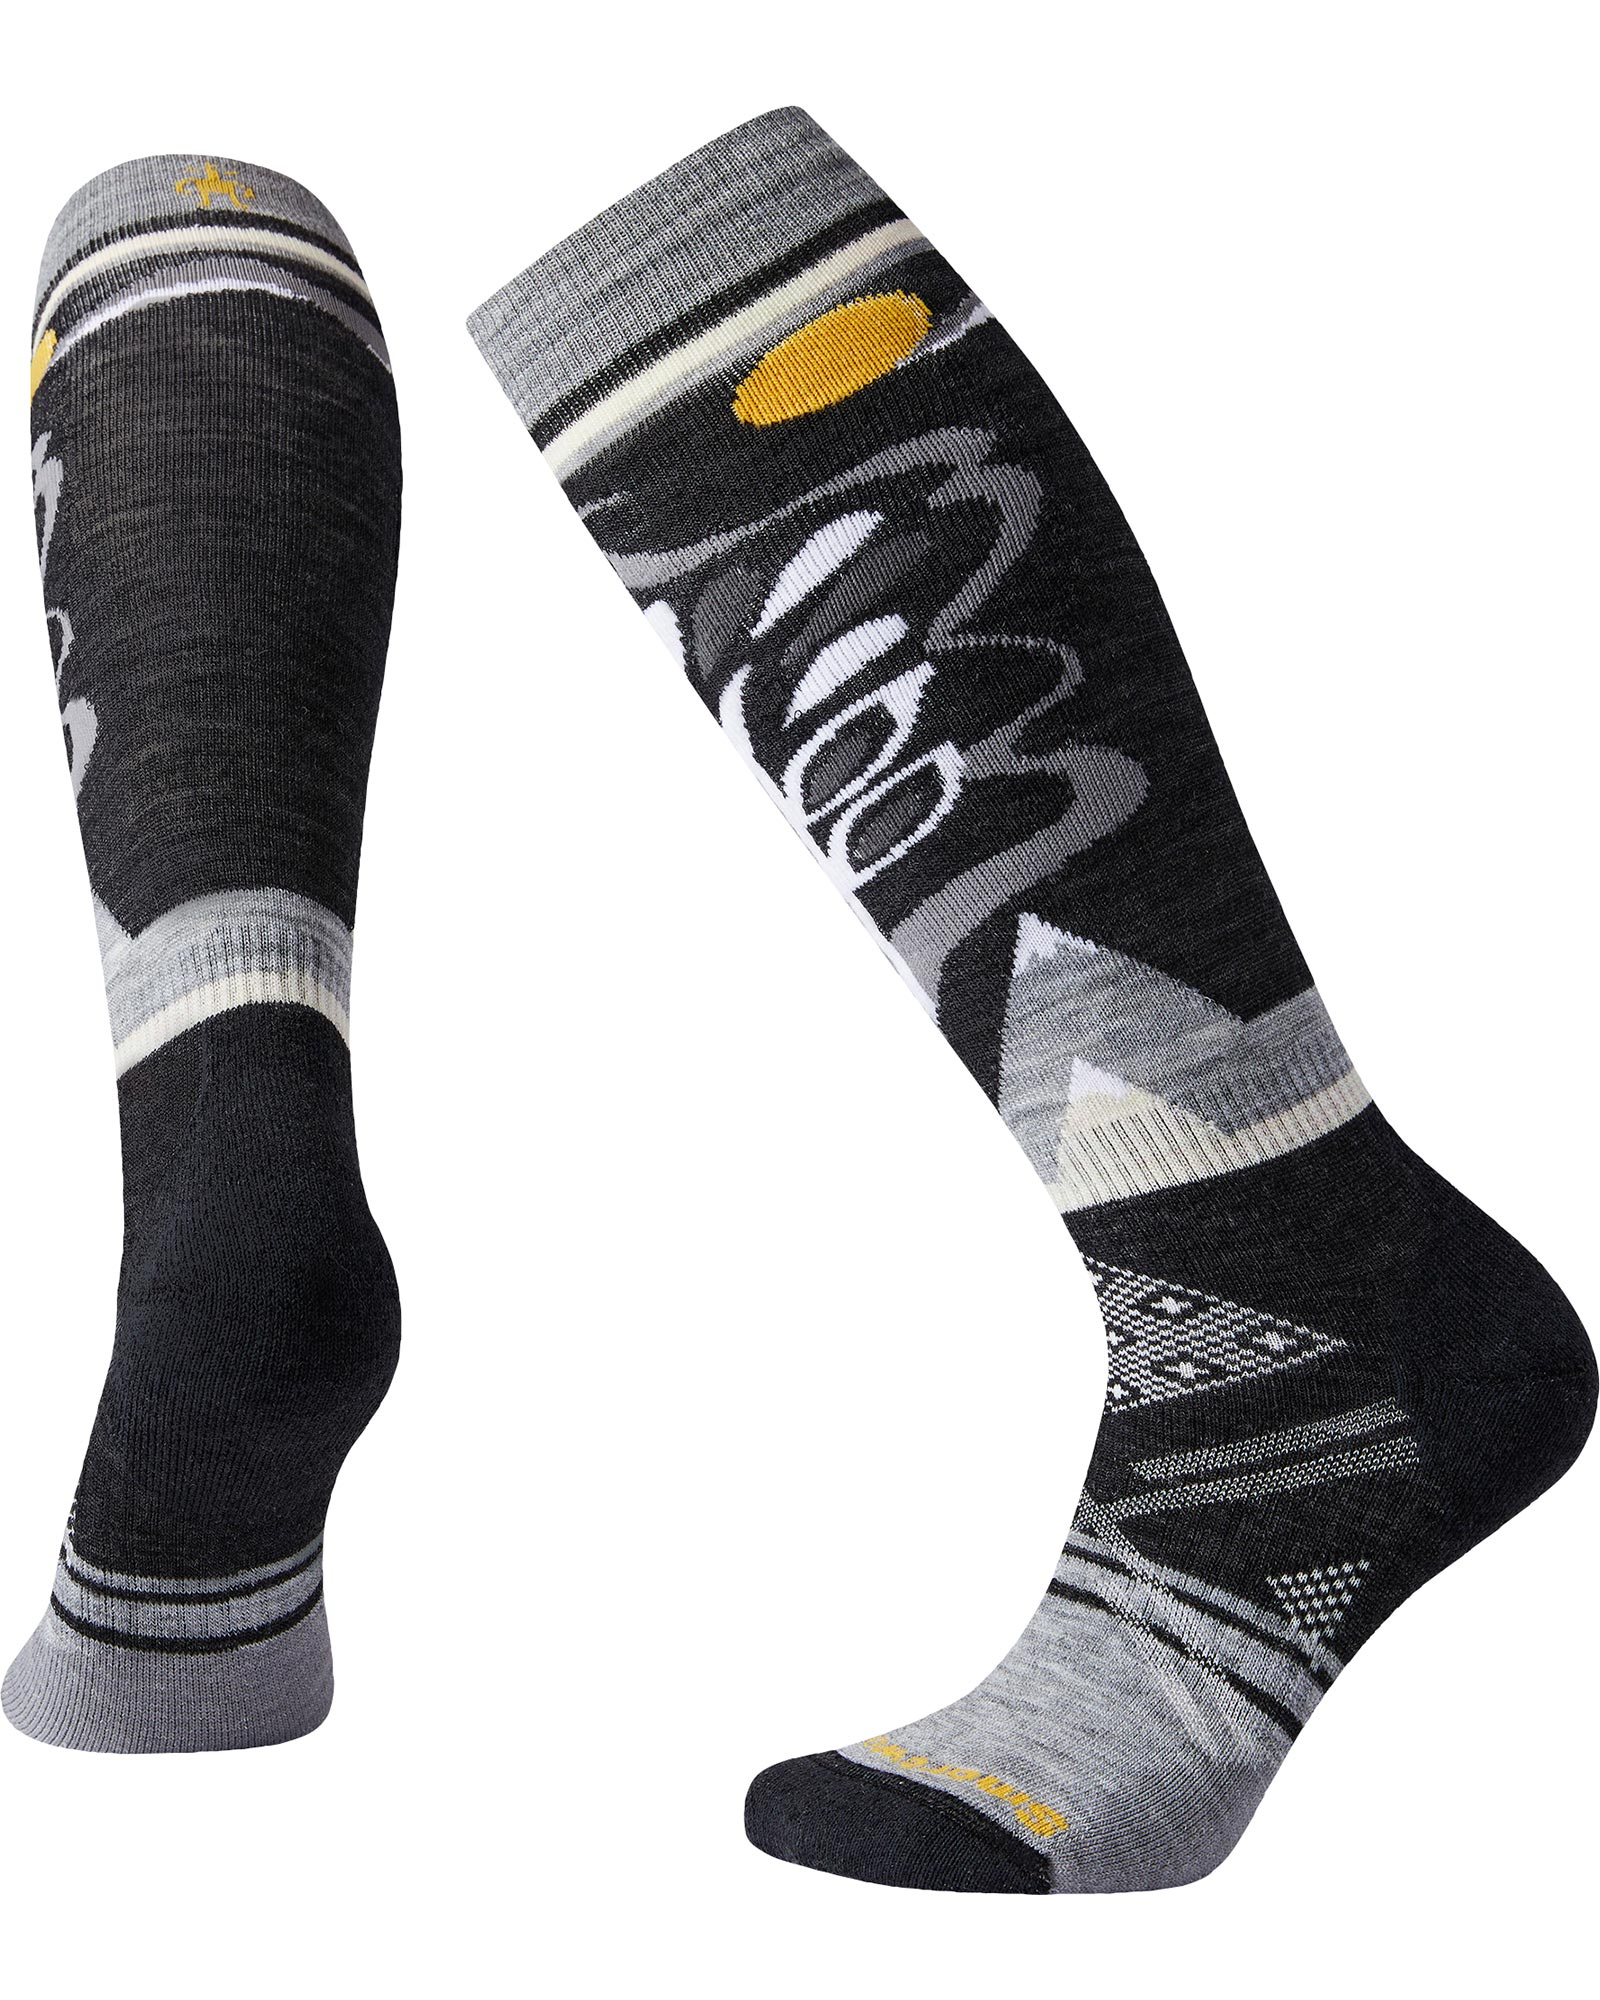 Smartwool Women's PhD Ski Medium Socks 0